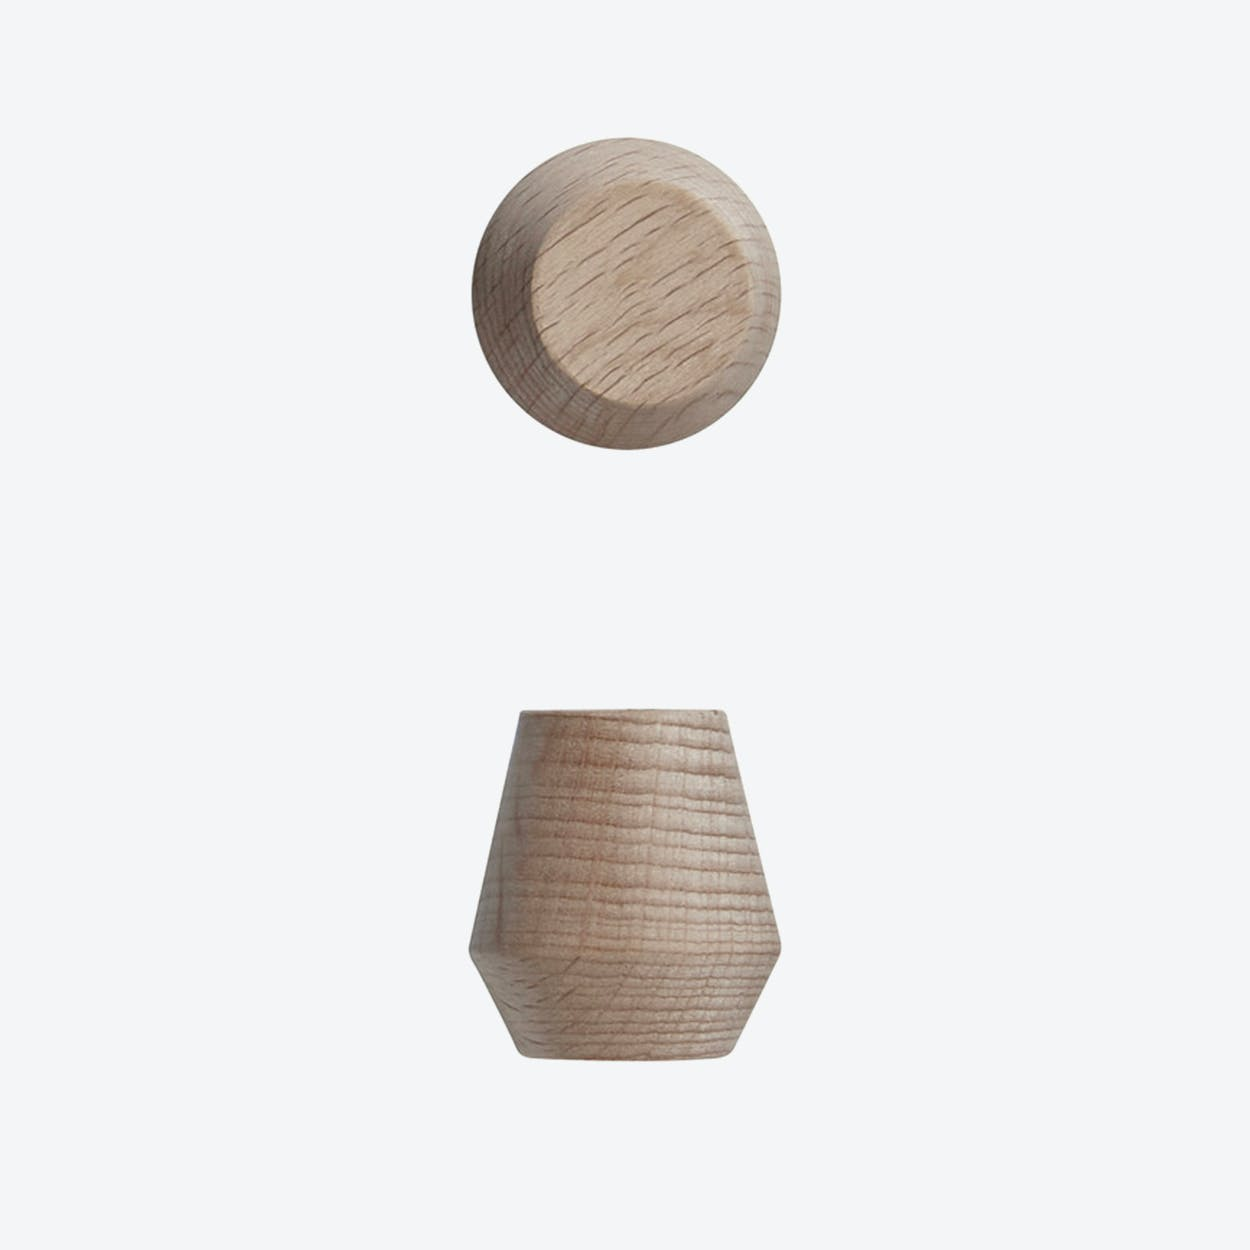 Saki Hook in Nature Wood (Set of 2)